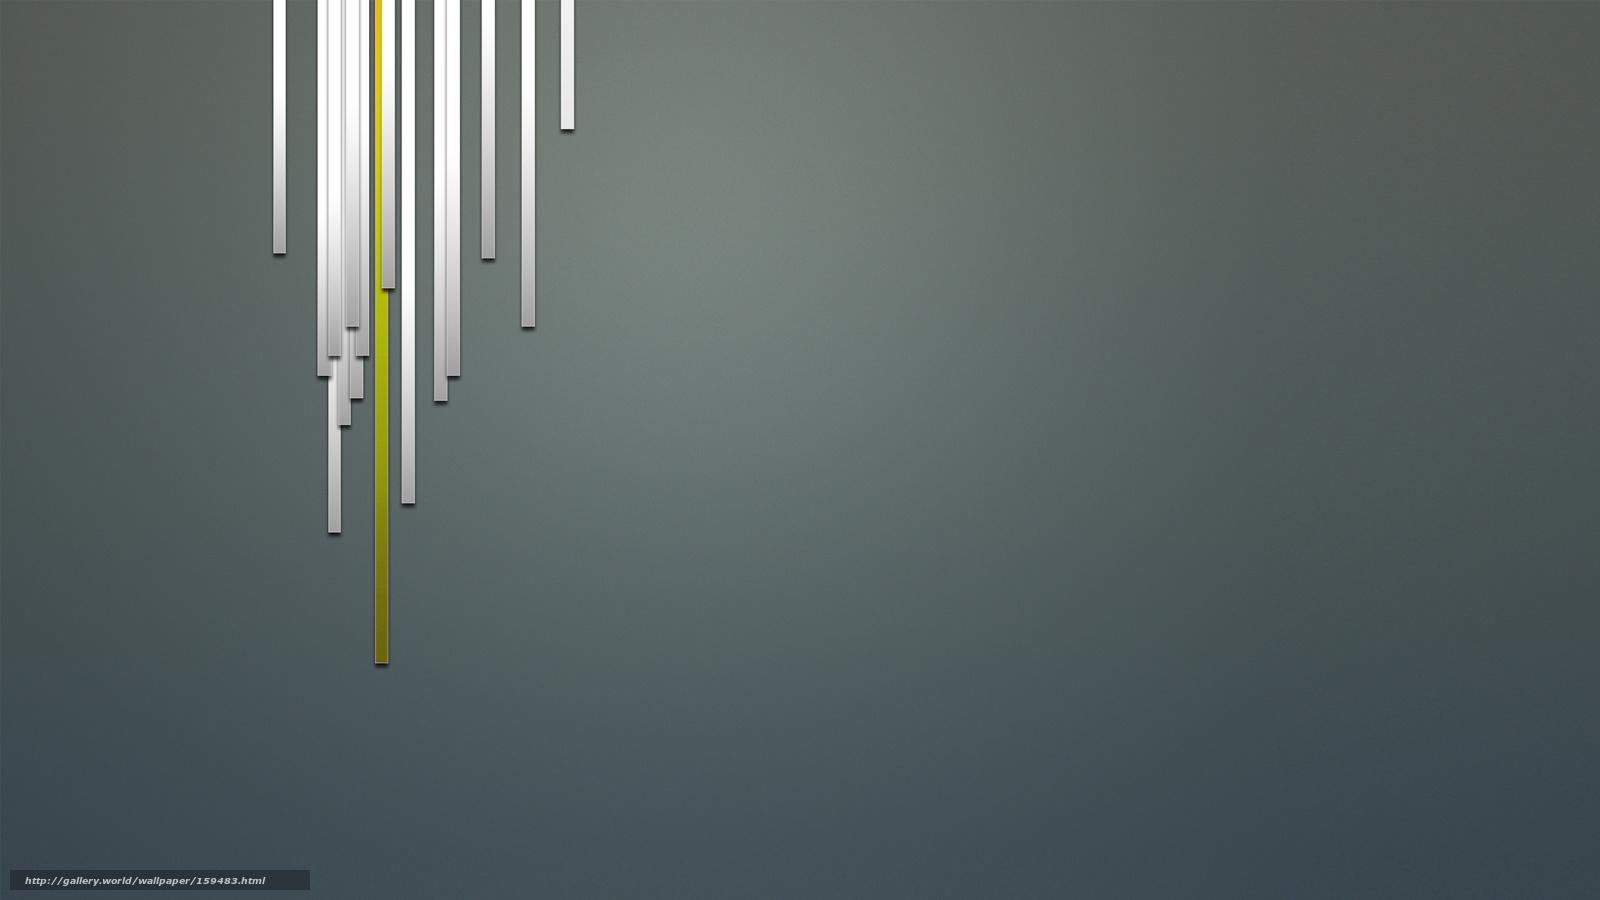 Download wallpaper line free desktop wallpaper in the resolution 1920x1080 — picture №159483